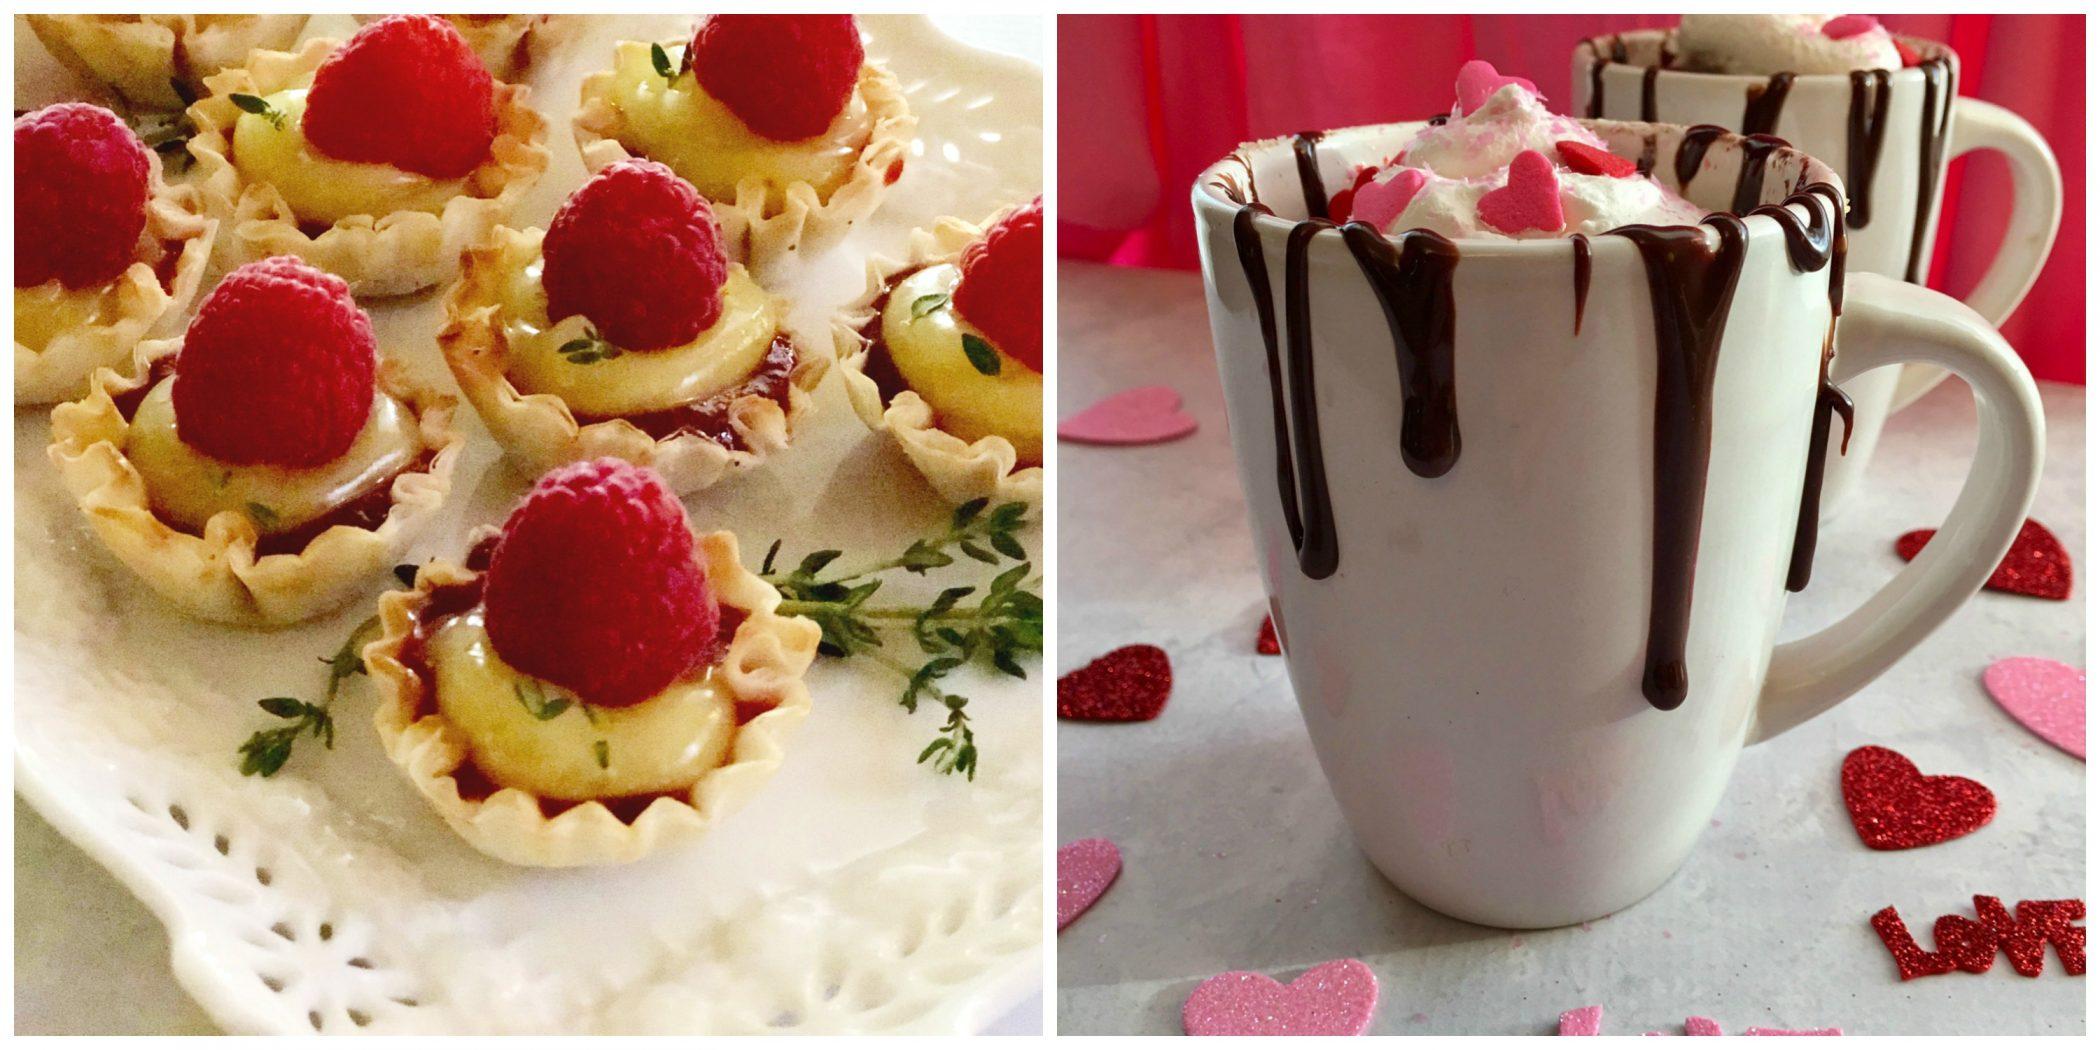 Raspberry Lemon Thyme Tartlets and Hot Chocolate Mug Cake